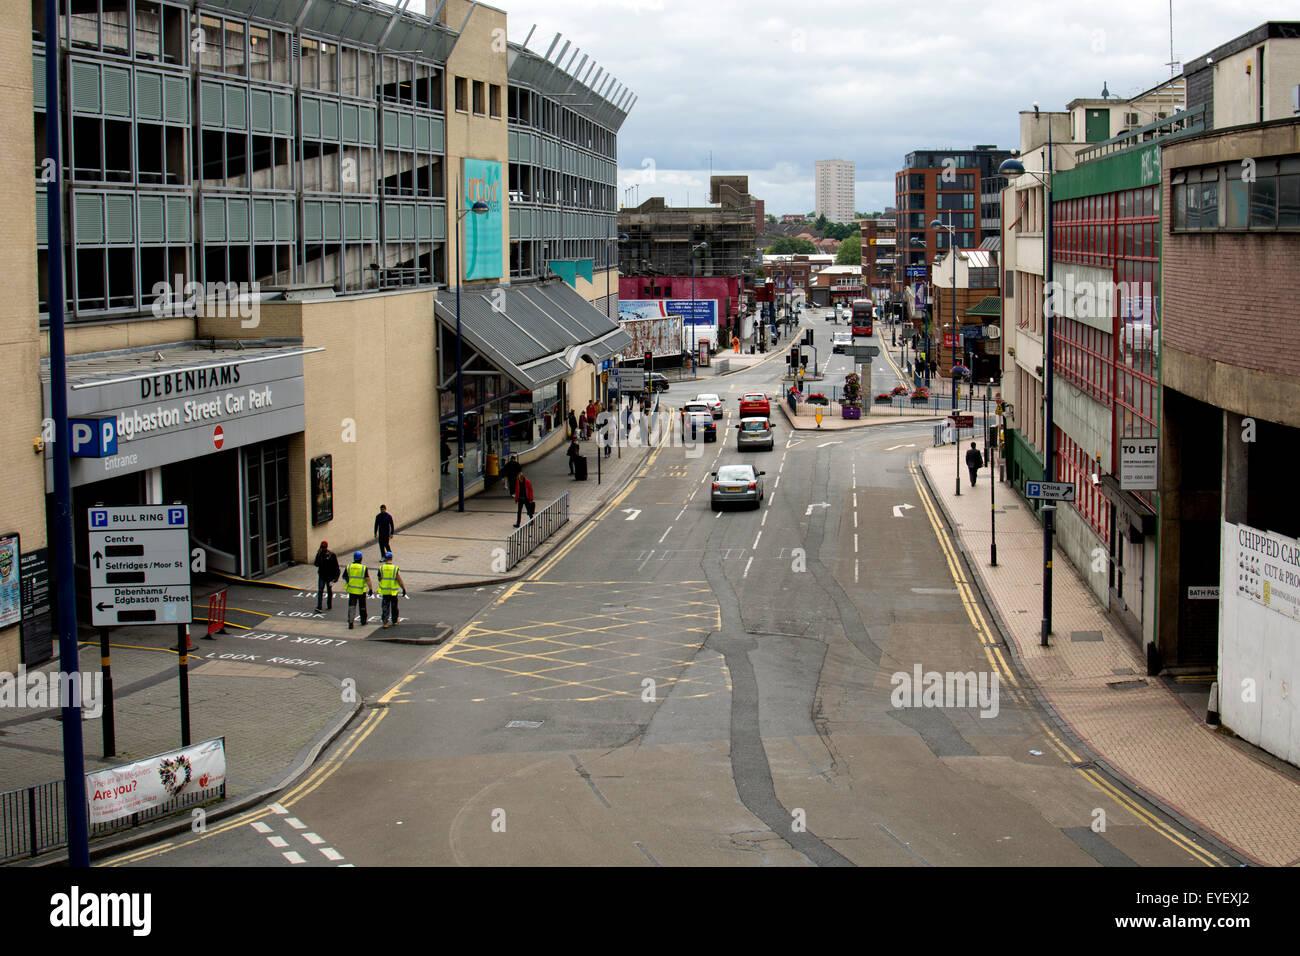 Dudley Street, Birmingham city centre, UK - Stock Image